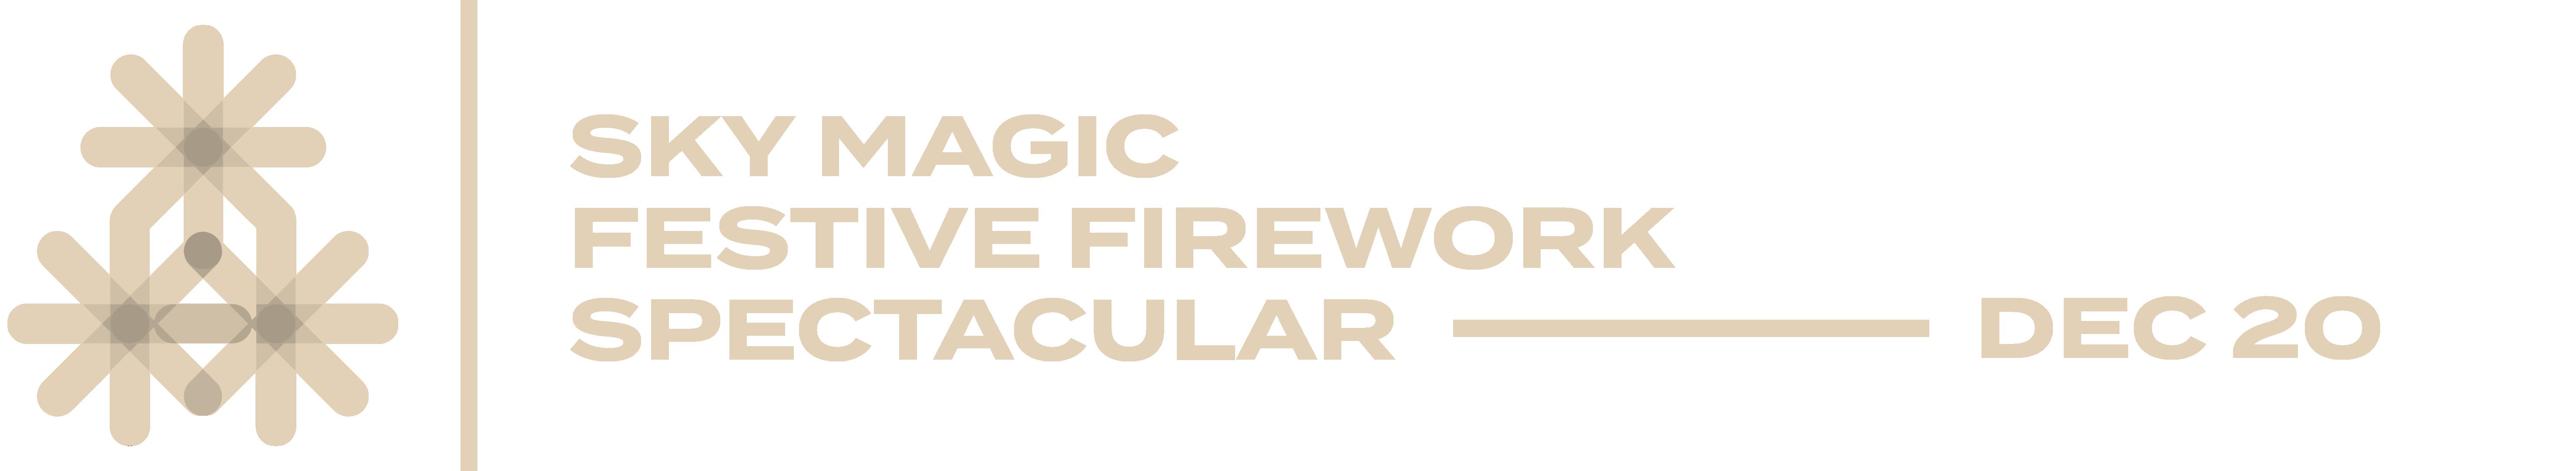 Sky Magic Drive-In Firework Spectacular